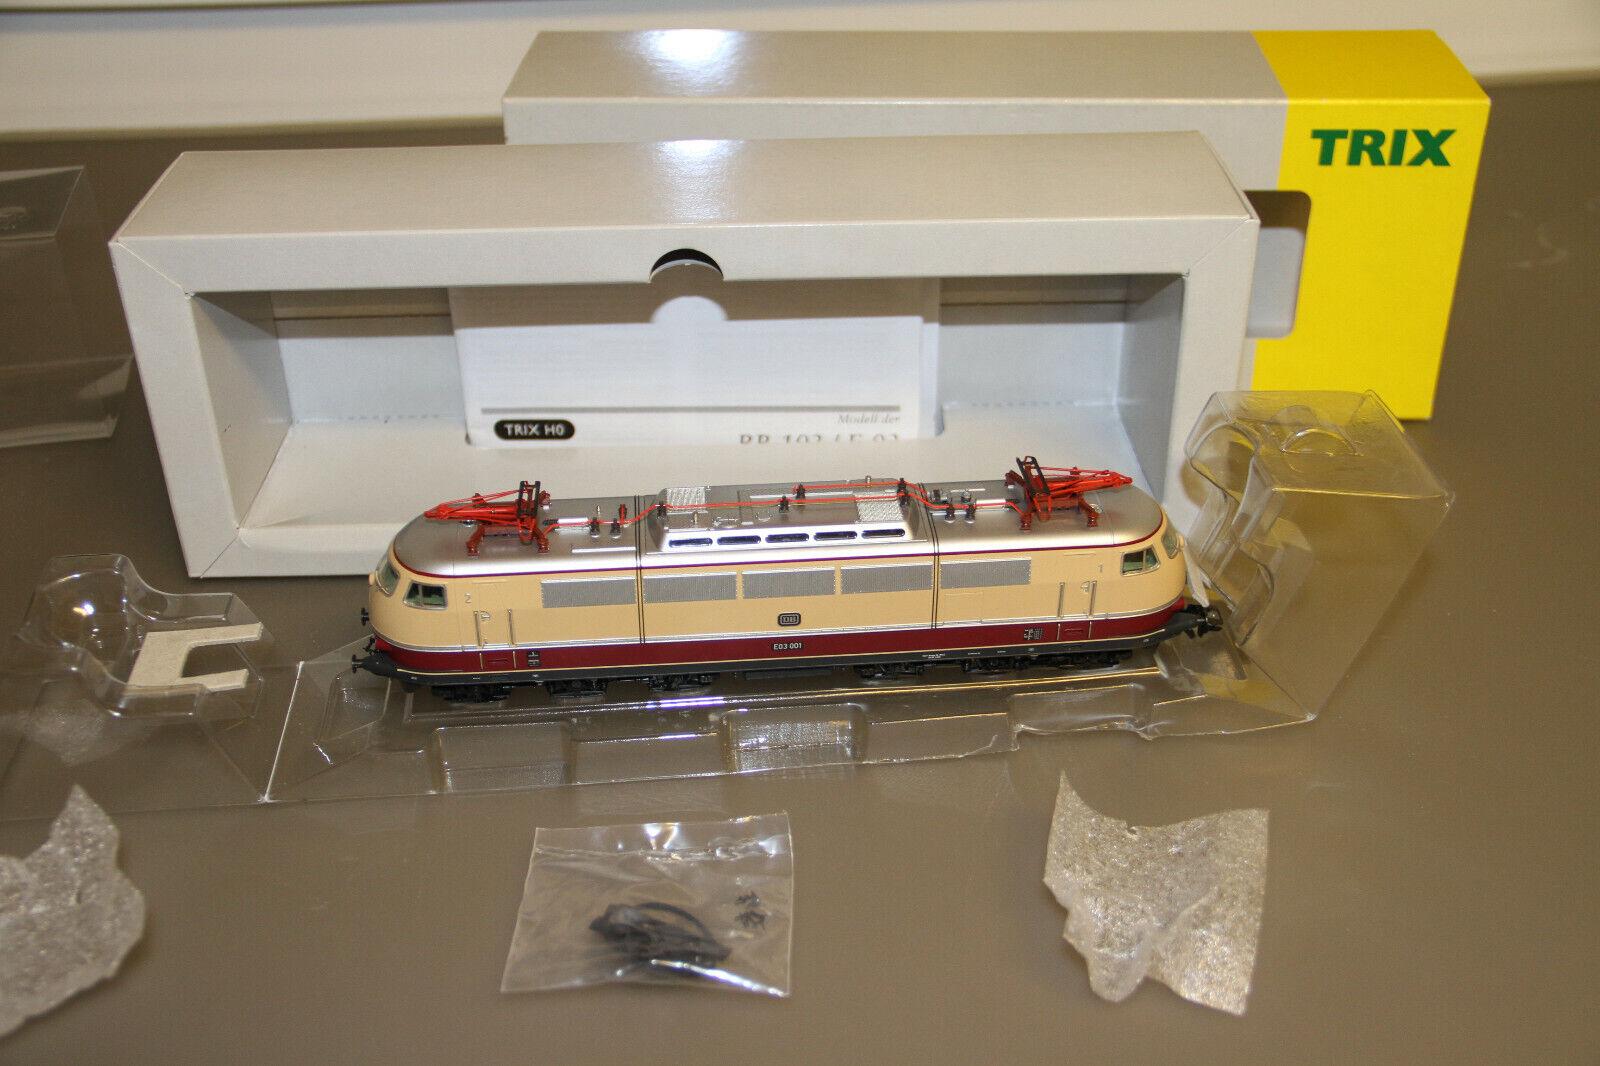 Märklin Trix h0 22118 br e03 001 corriente alterna mfx transformación embalaje original sin usar